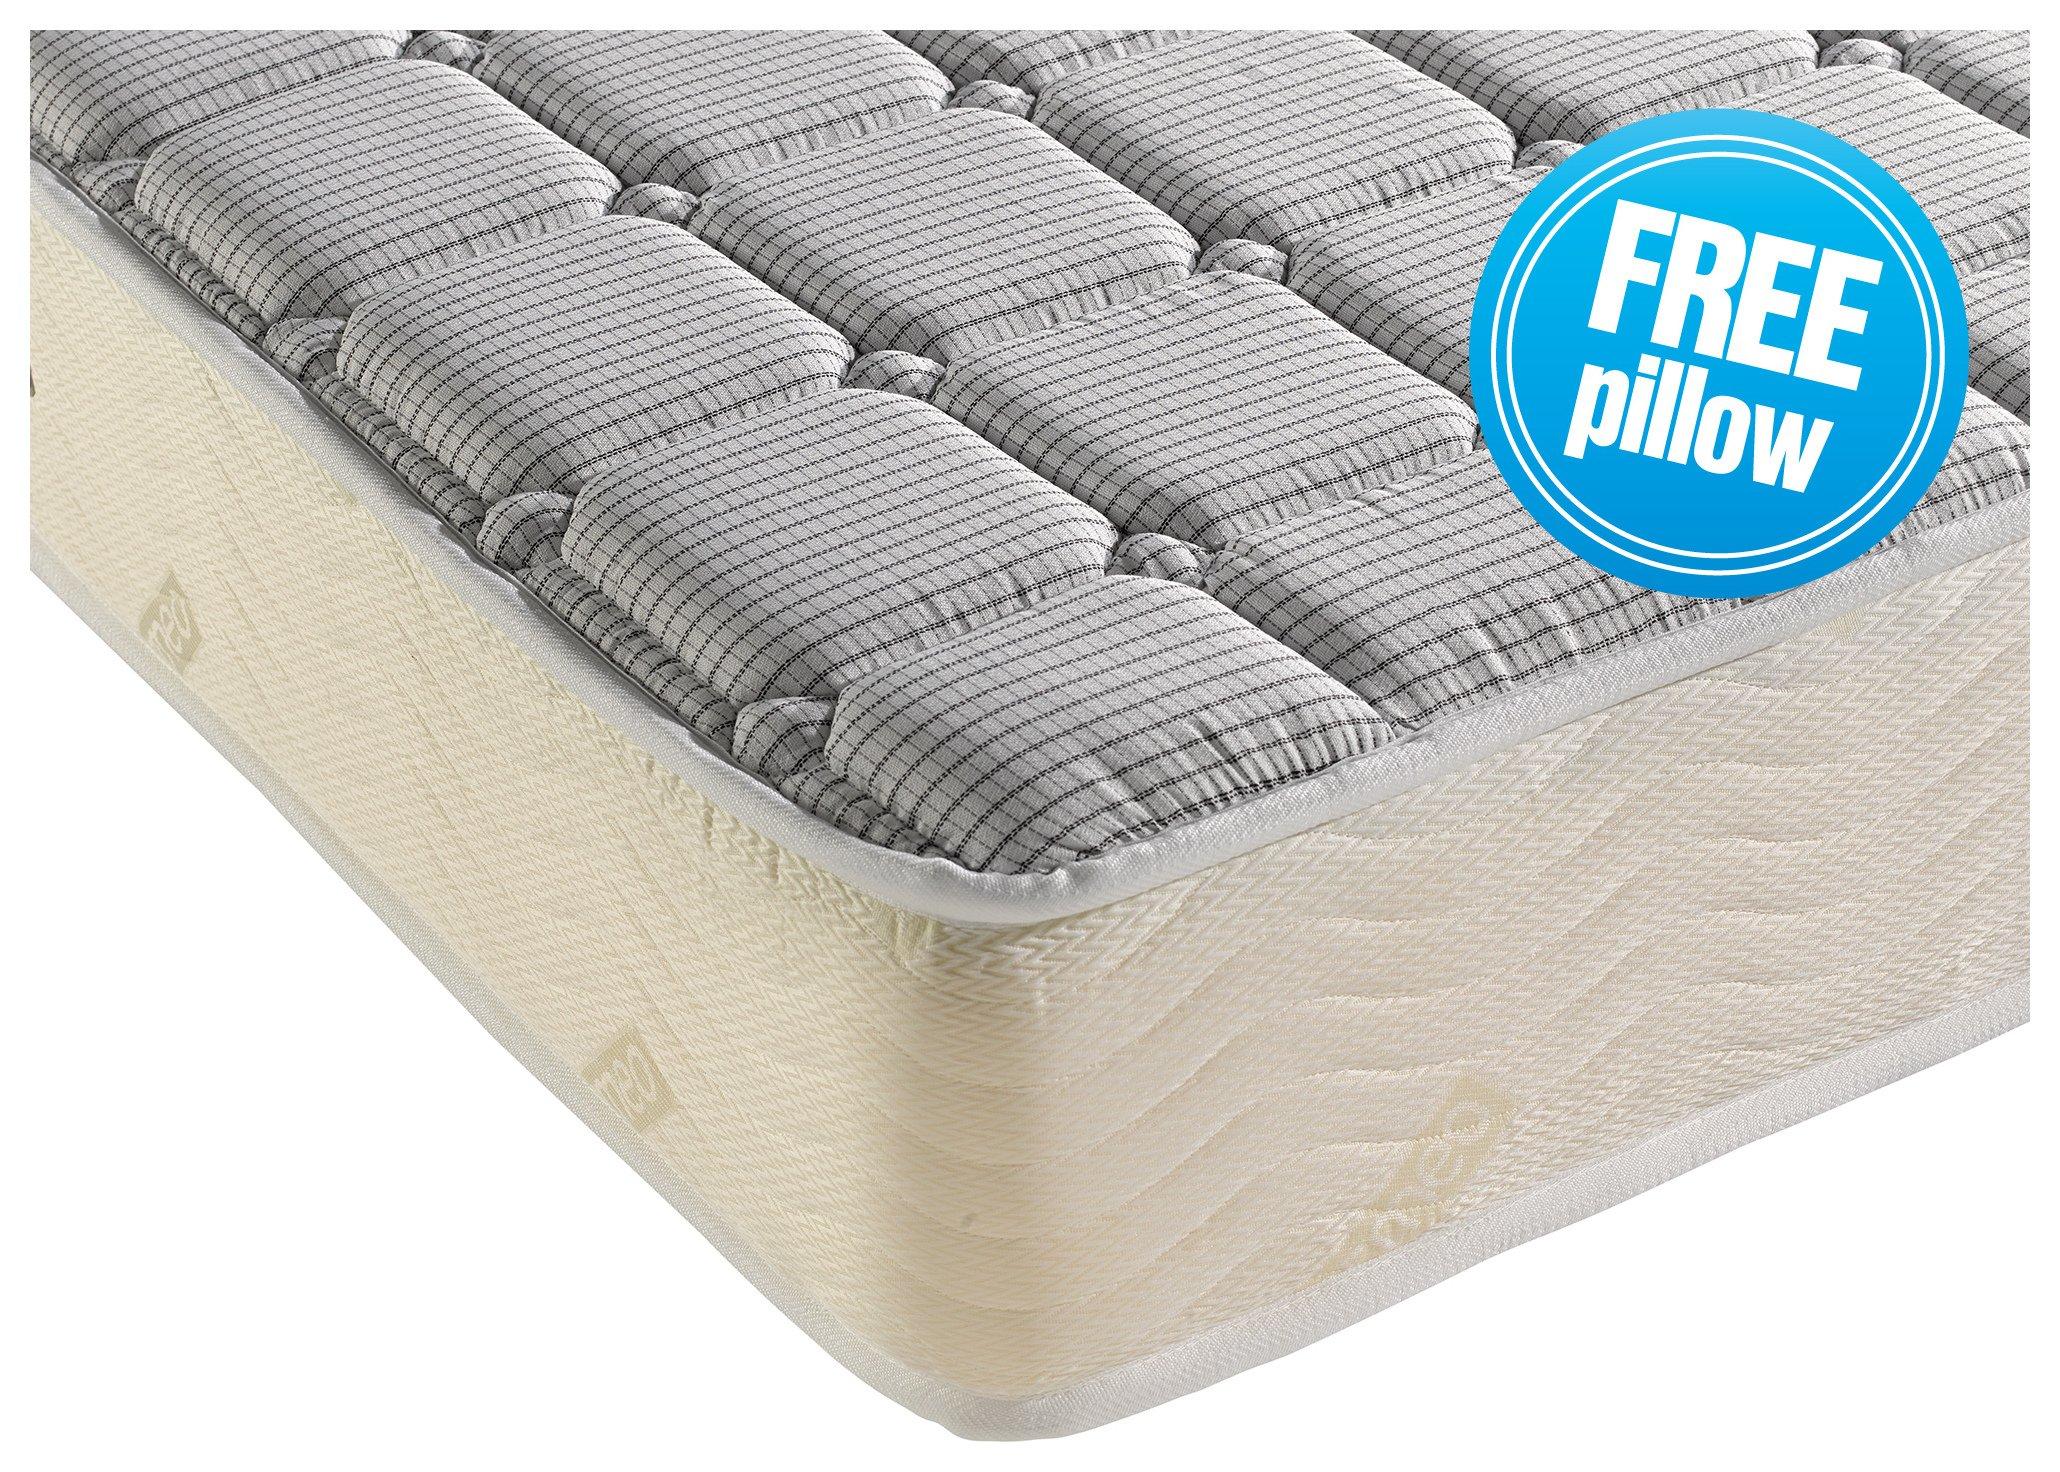 Dormeo Deluxe Memory Foam Superking Mattress